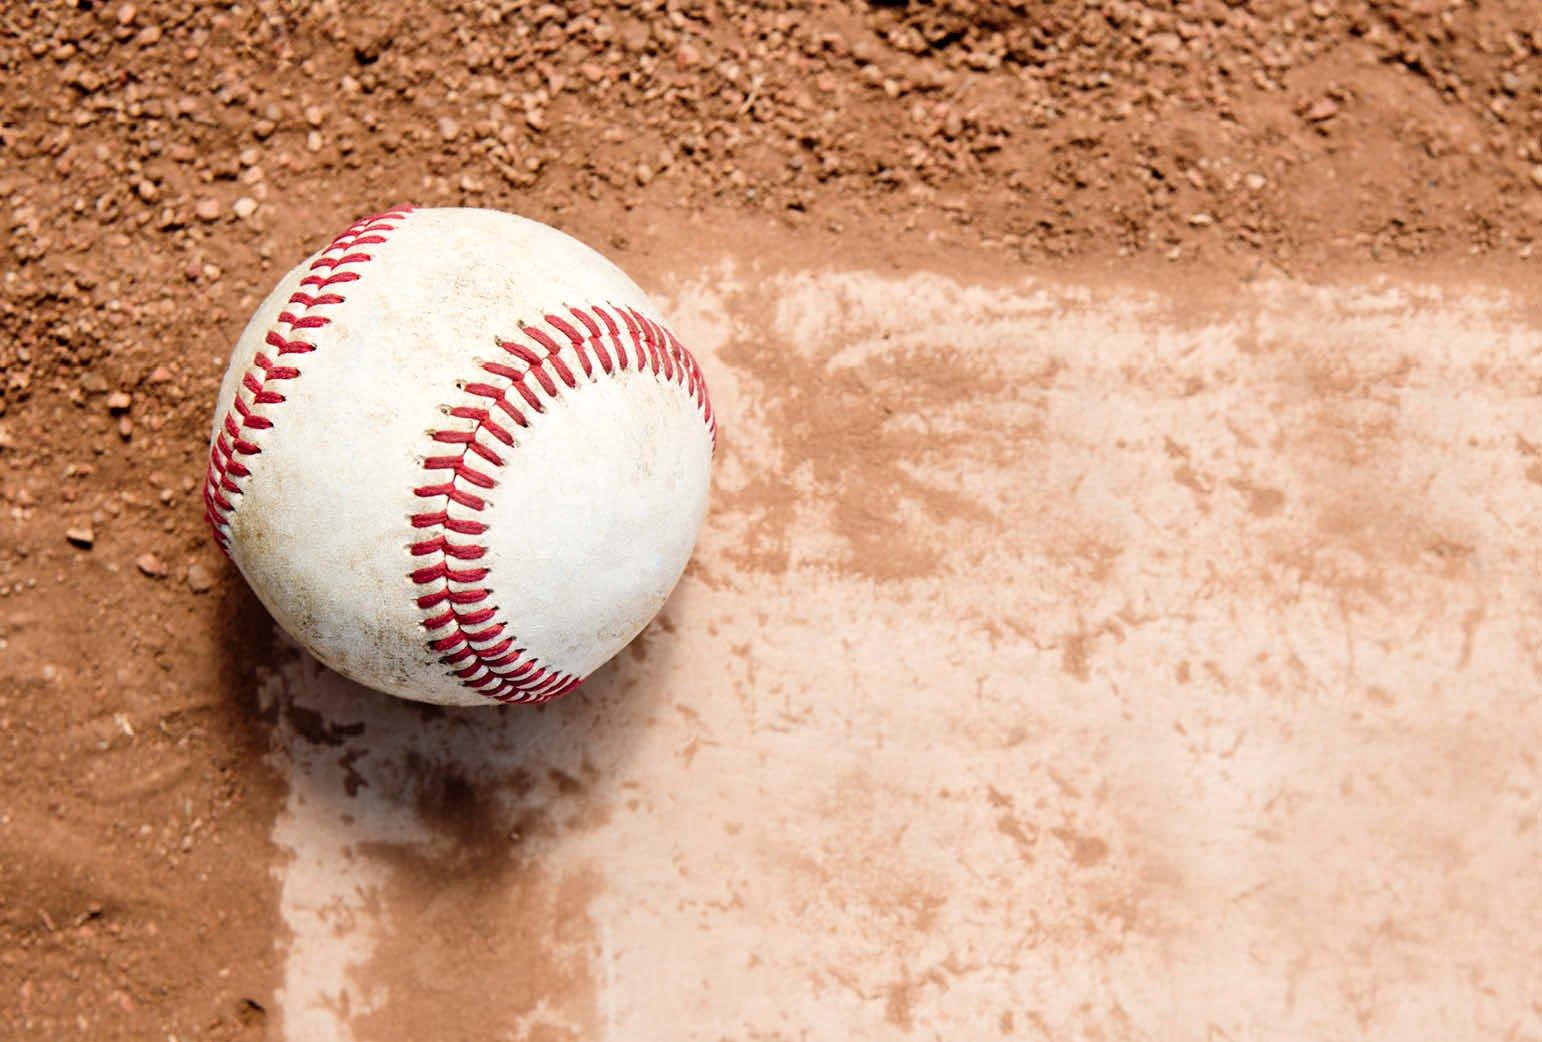 A baseball sits on a field.